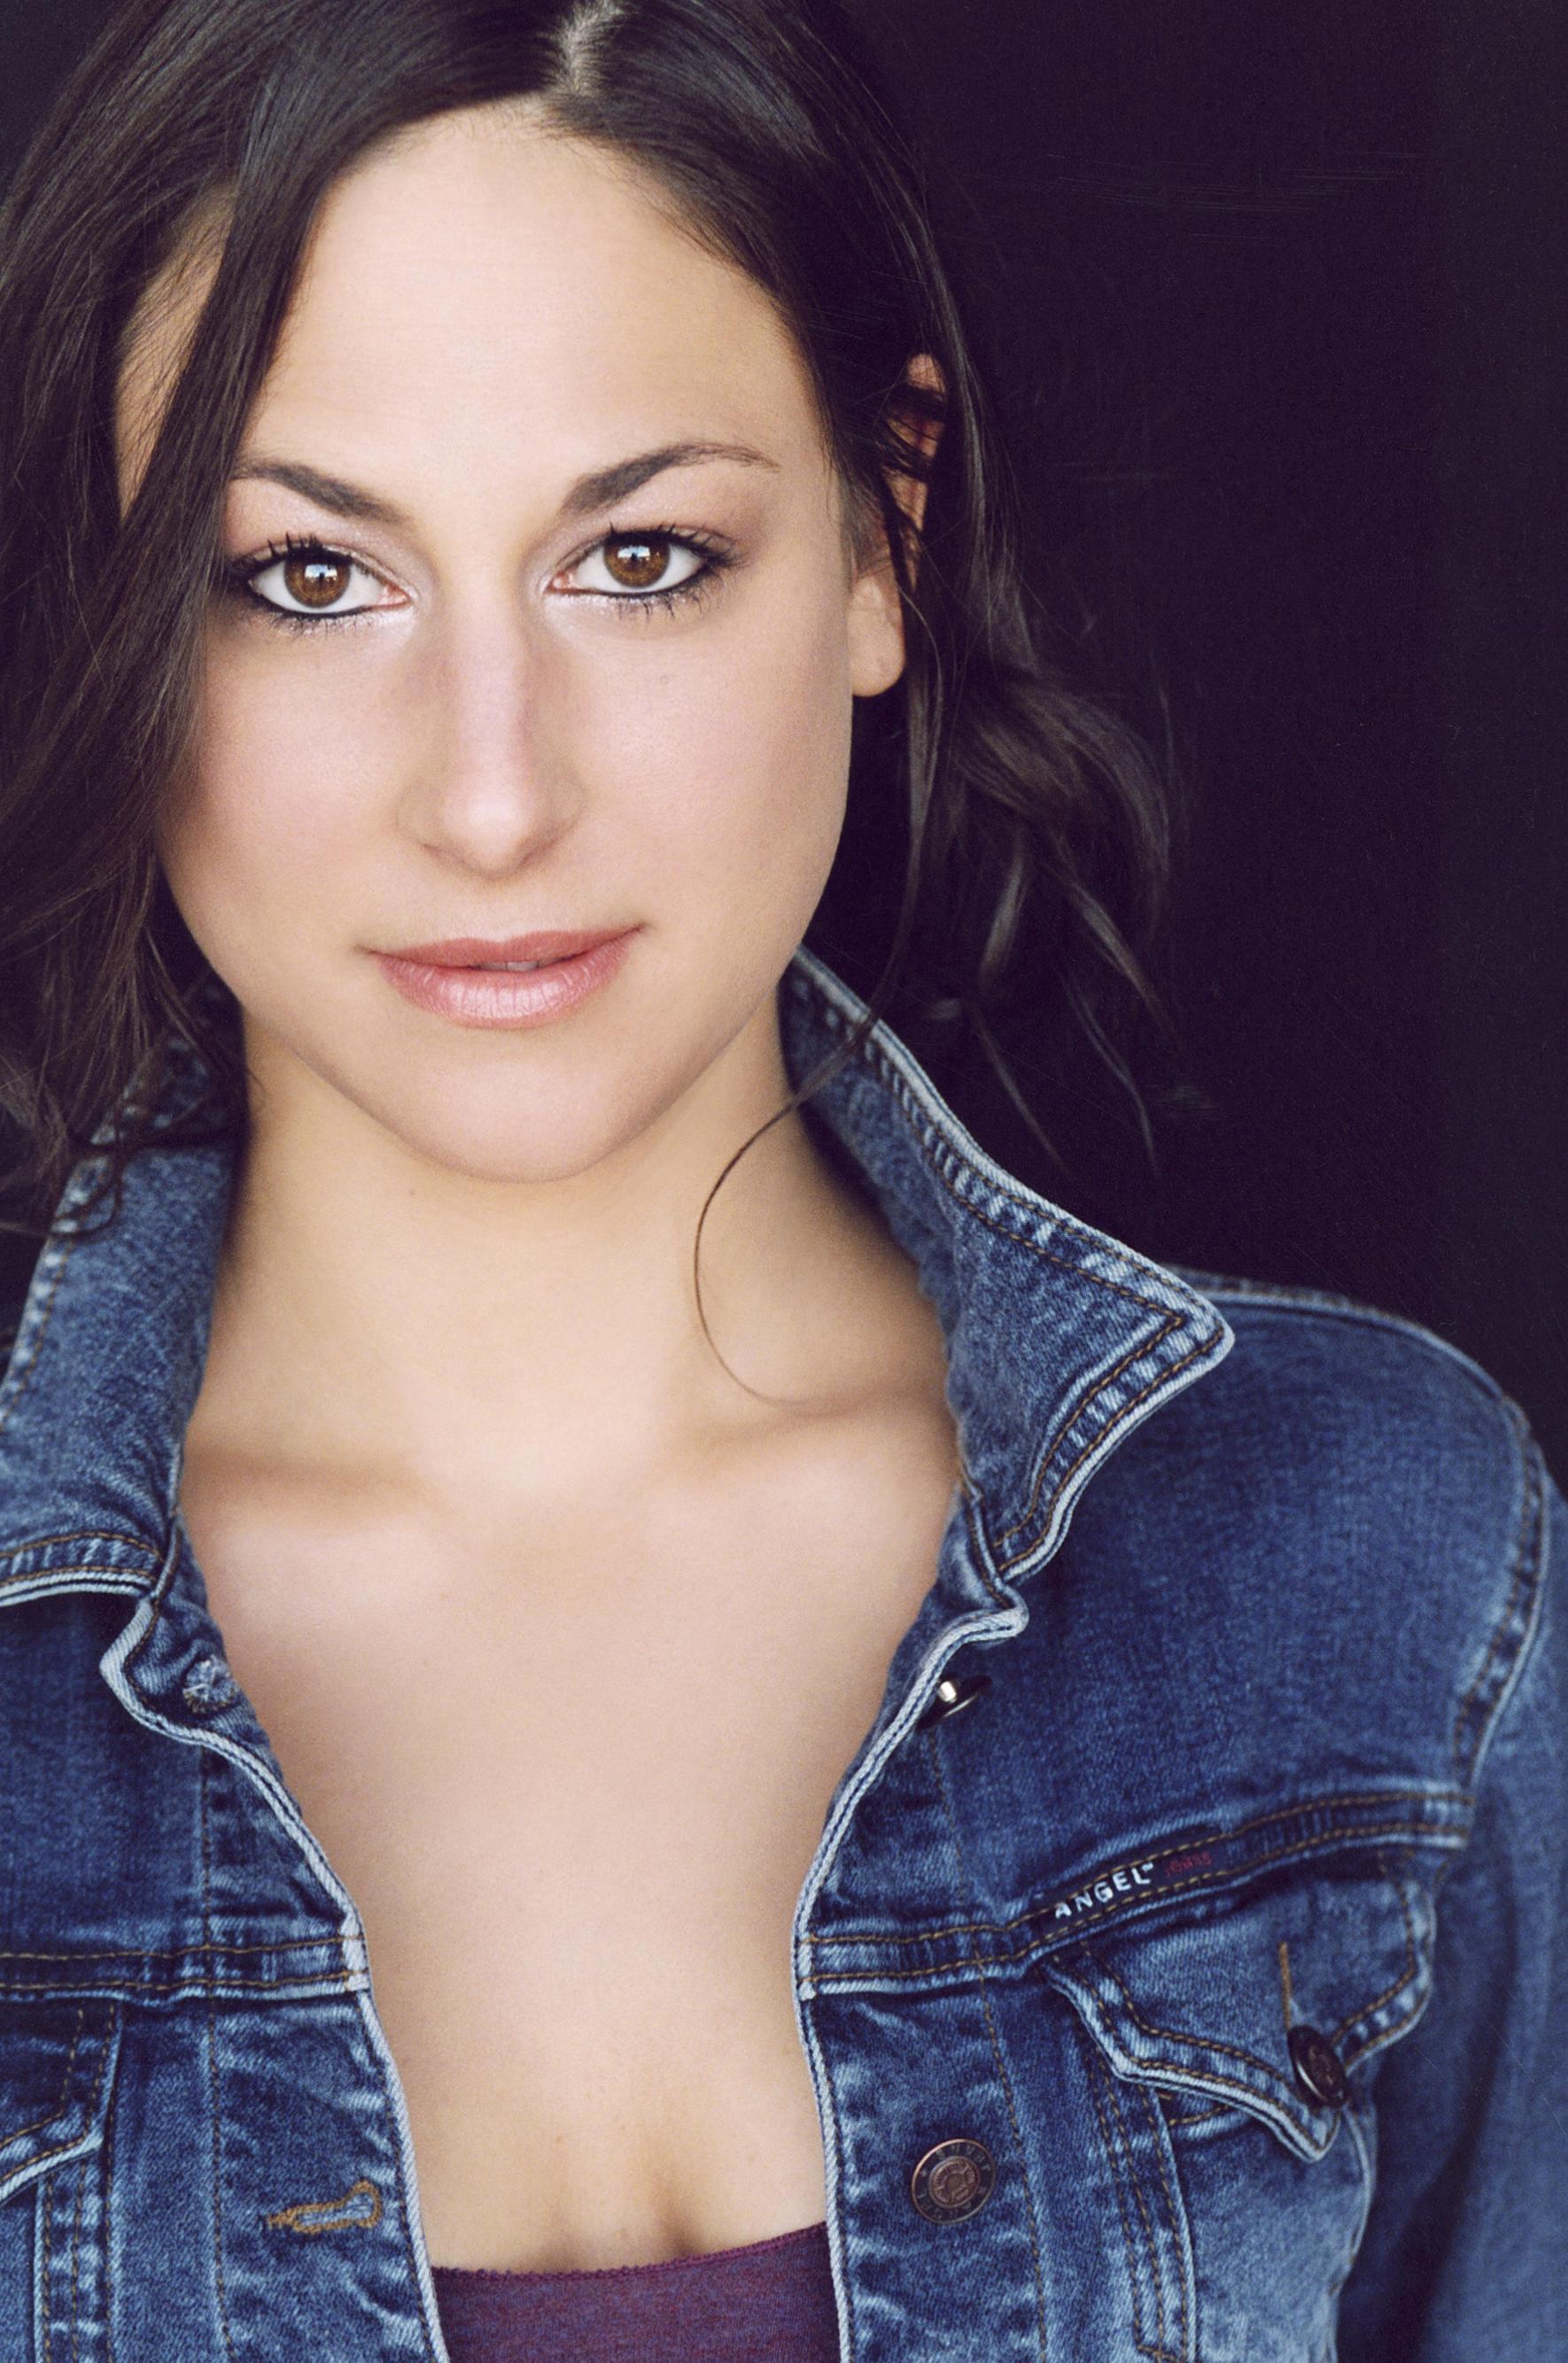 Rachel Anne Miles